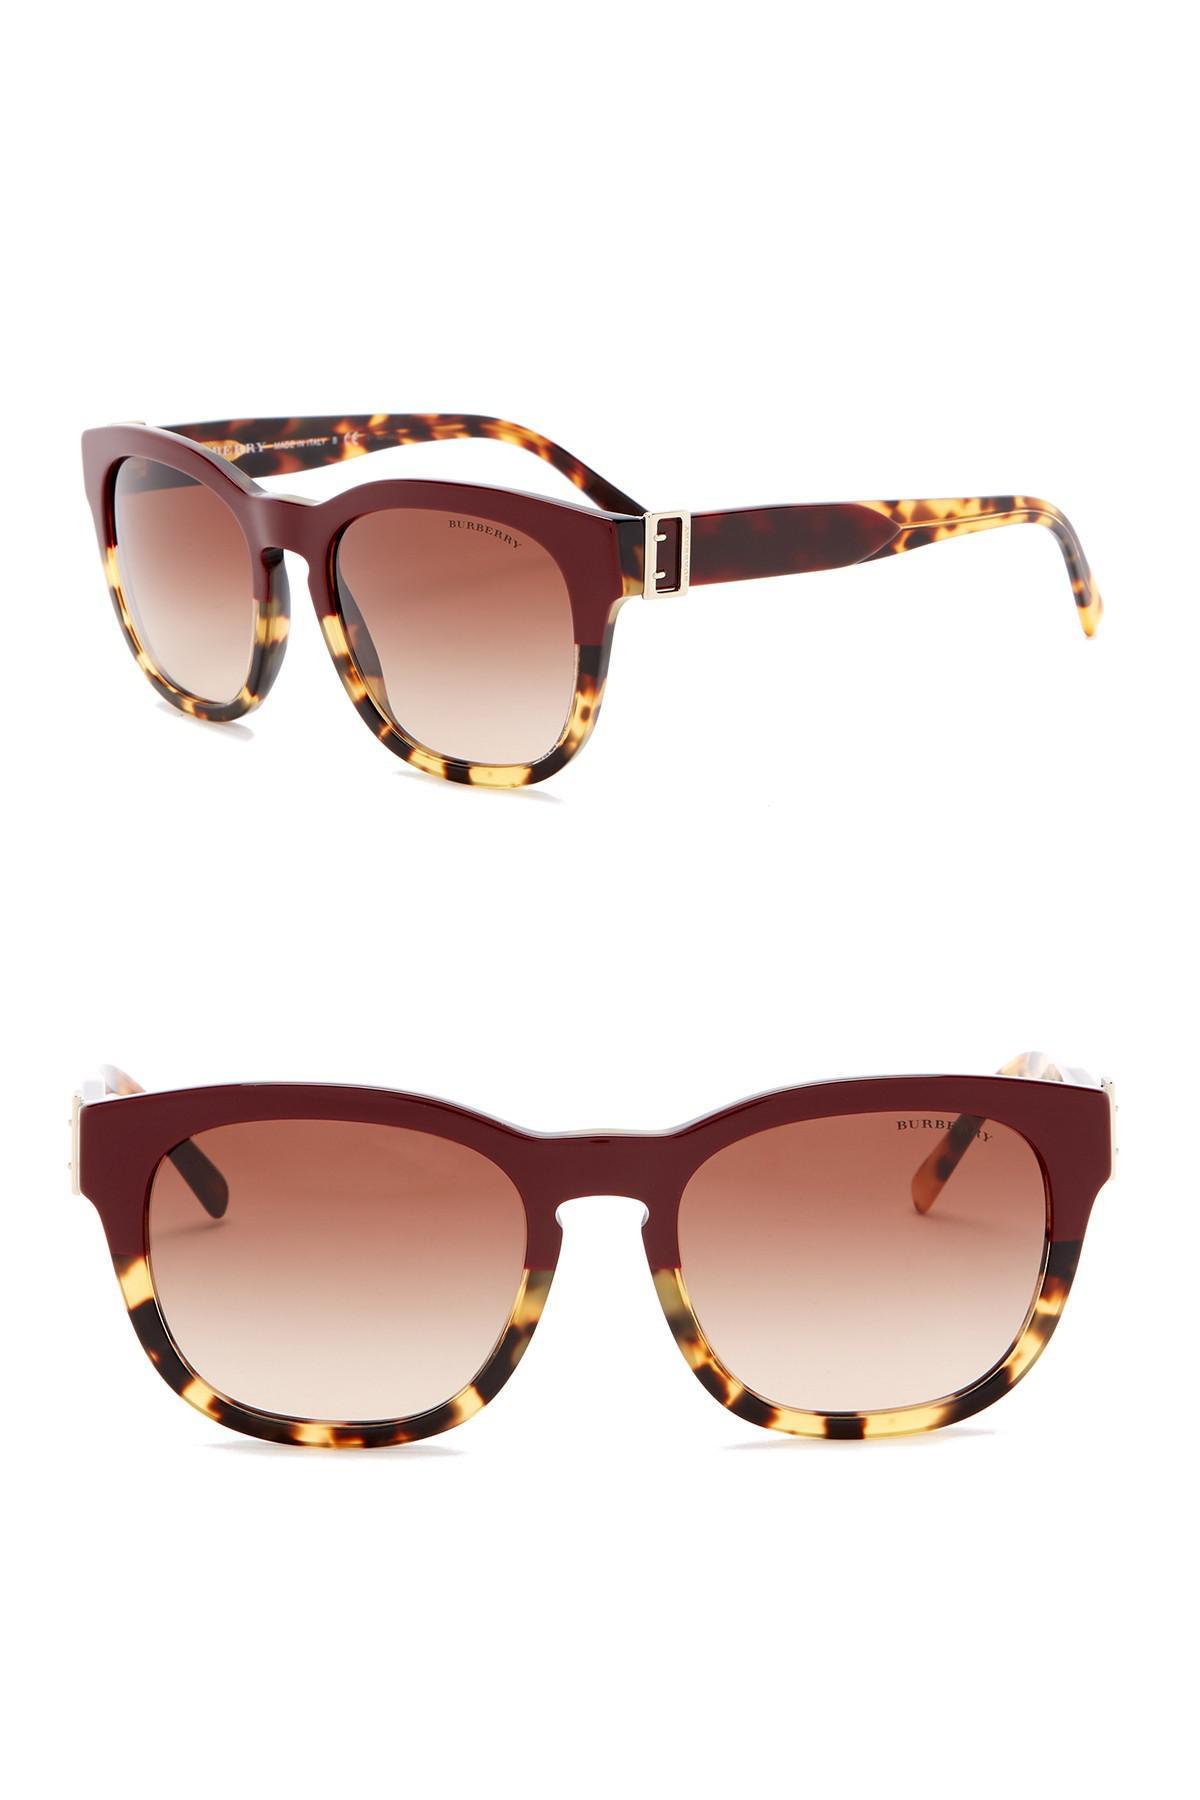 cab24076fd8 Burberry - Brown 54mm Round Sunglasses - Lyst. View fullscreen